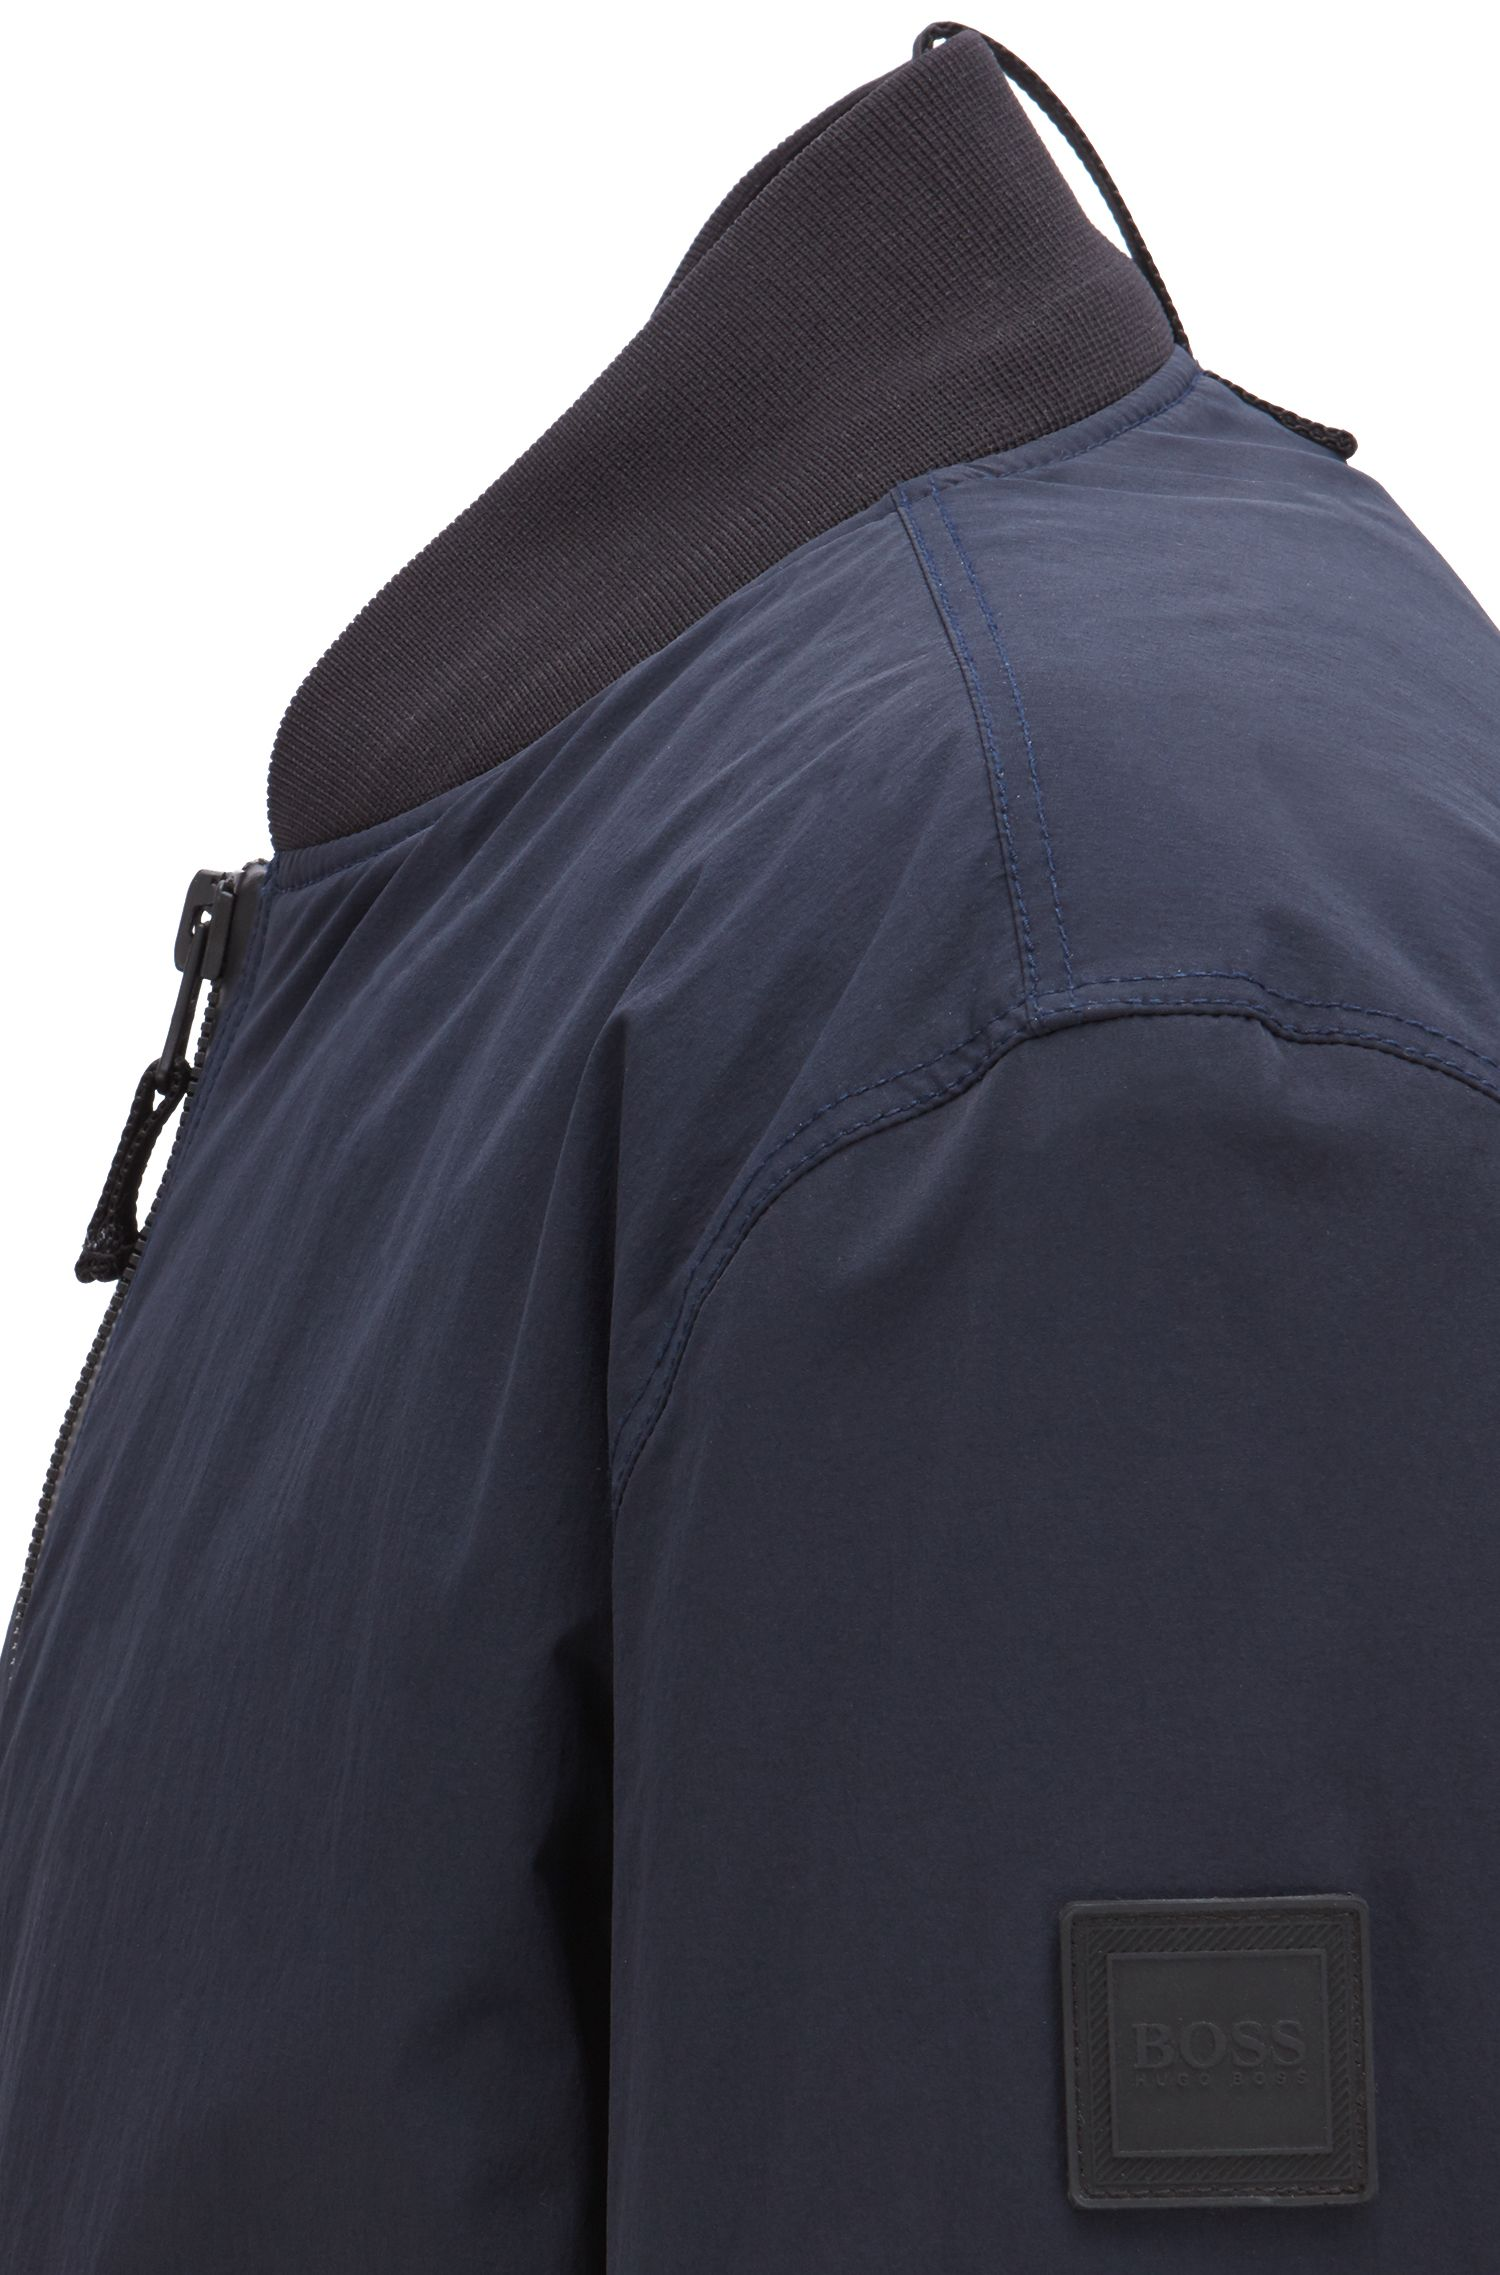 Waterafstotend bomberjack met PrimaLoft®-vulling, Donkerblauw